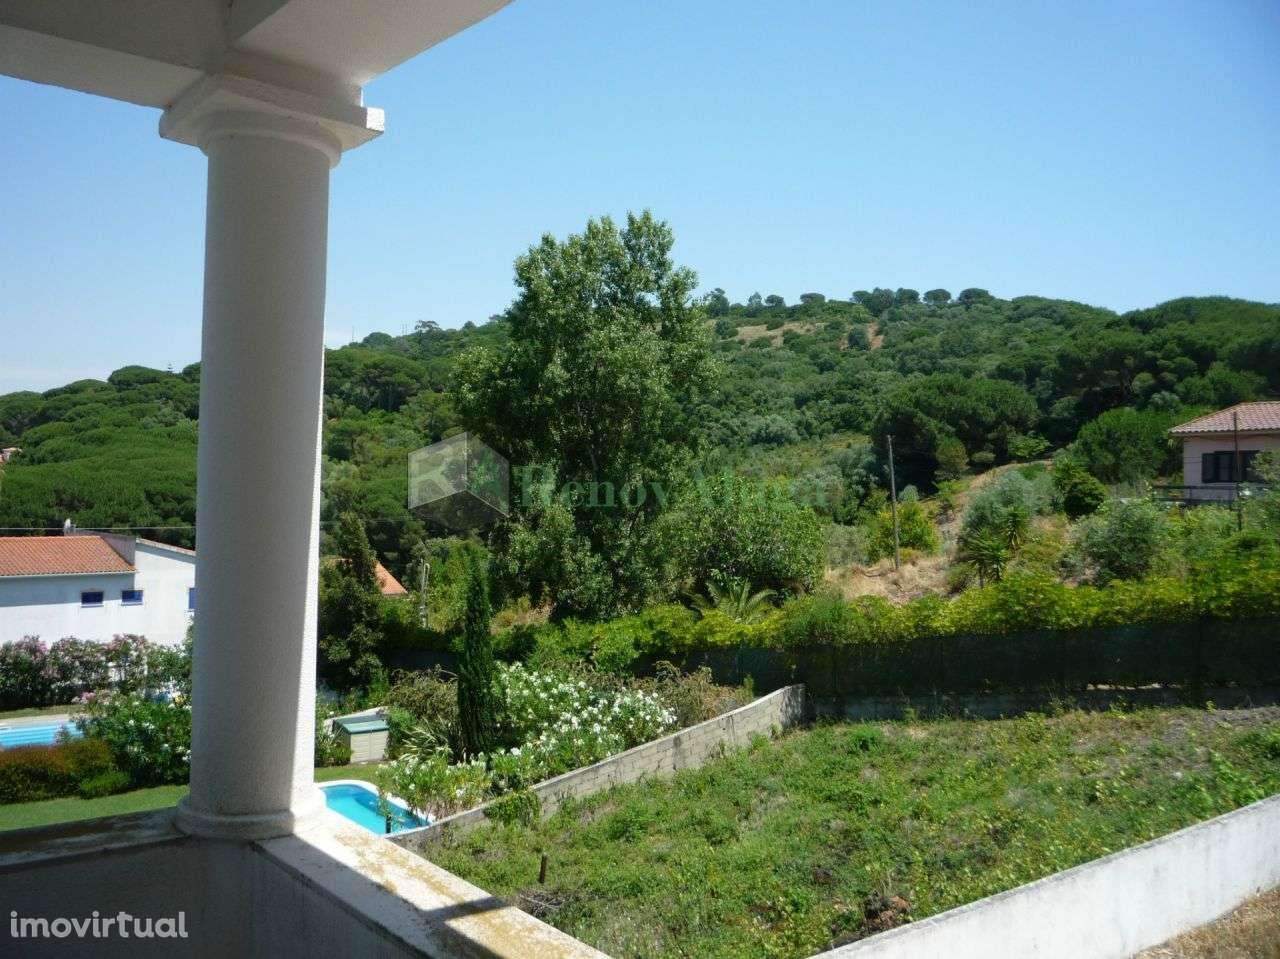 Moradia para arrendar, Quinta do Anjo, Setúbal - Foto 9